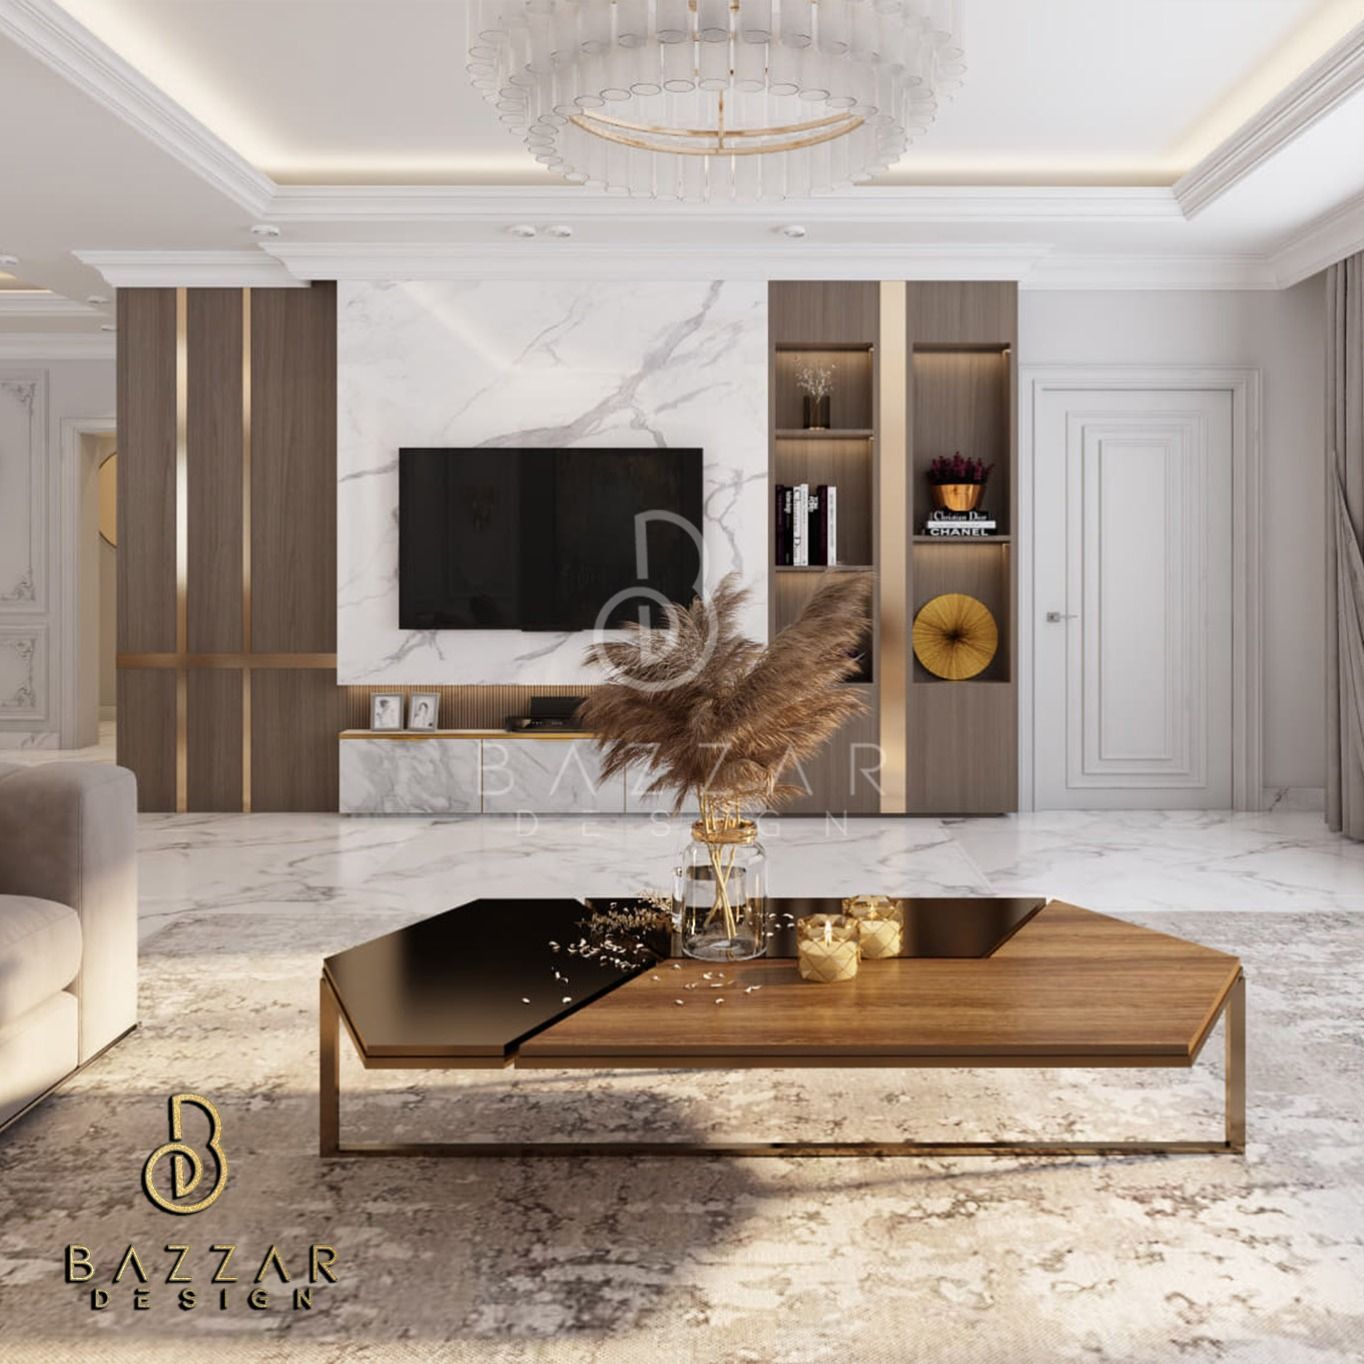 10 Ideas For Living Room Design Room Design Interior Architecture Design Plafond Design